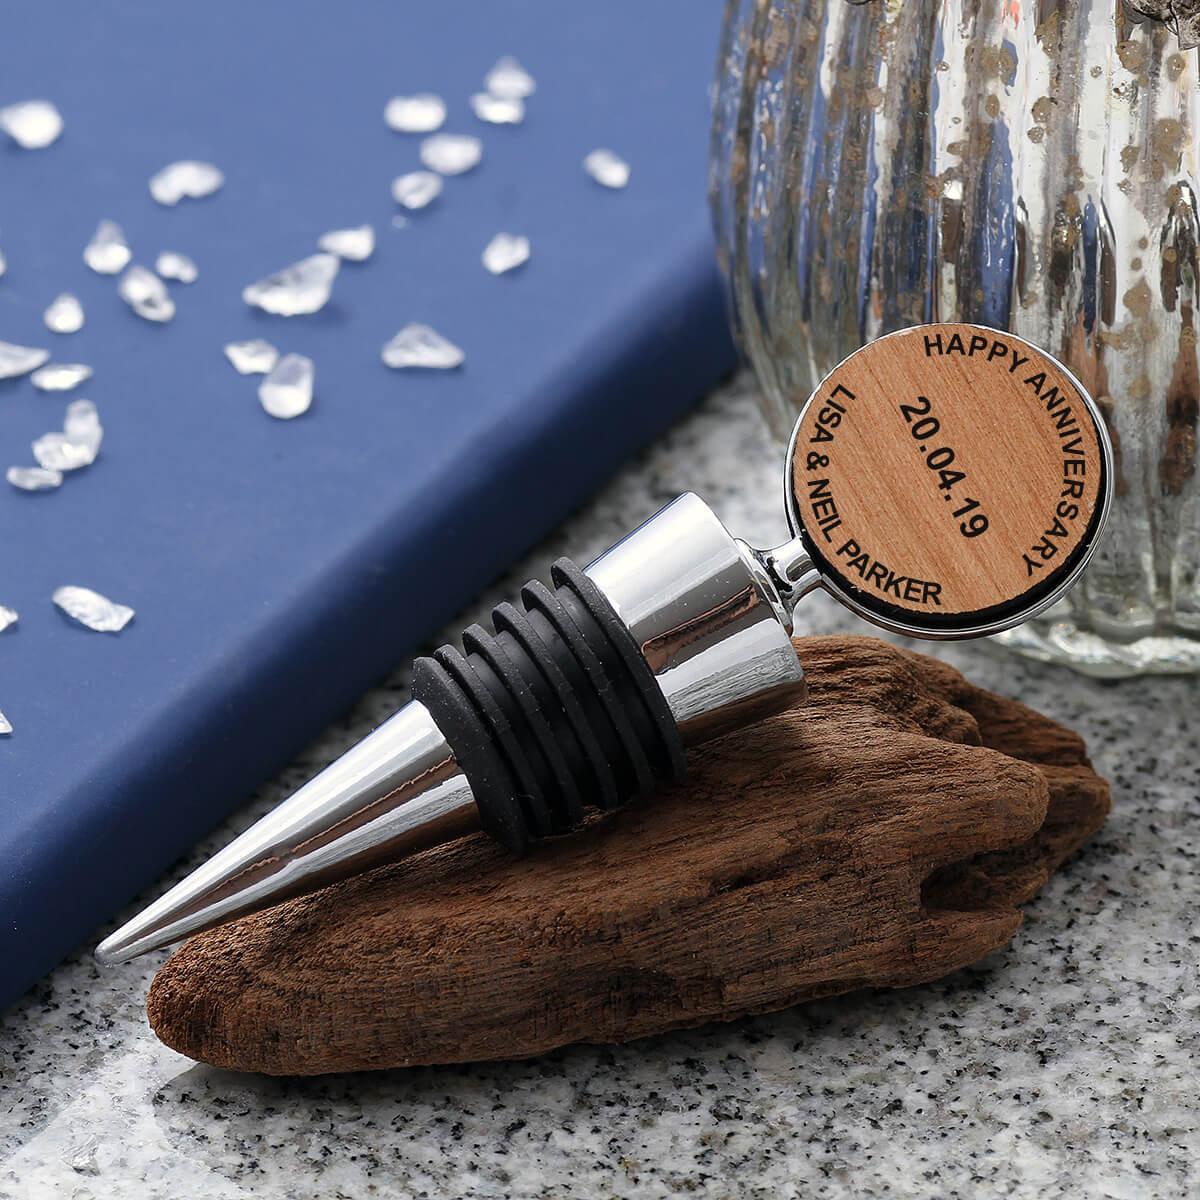 personalised Wooden Bottle Stopper